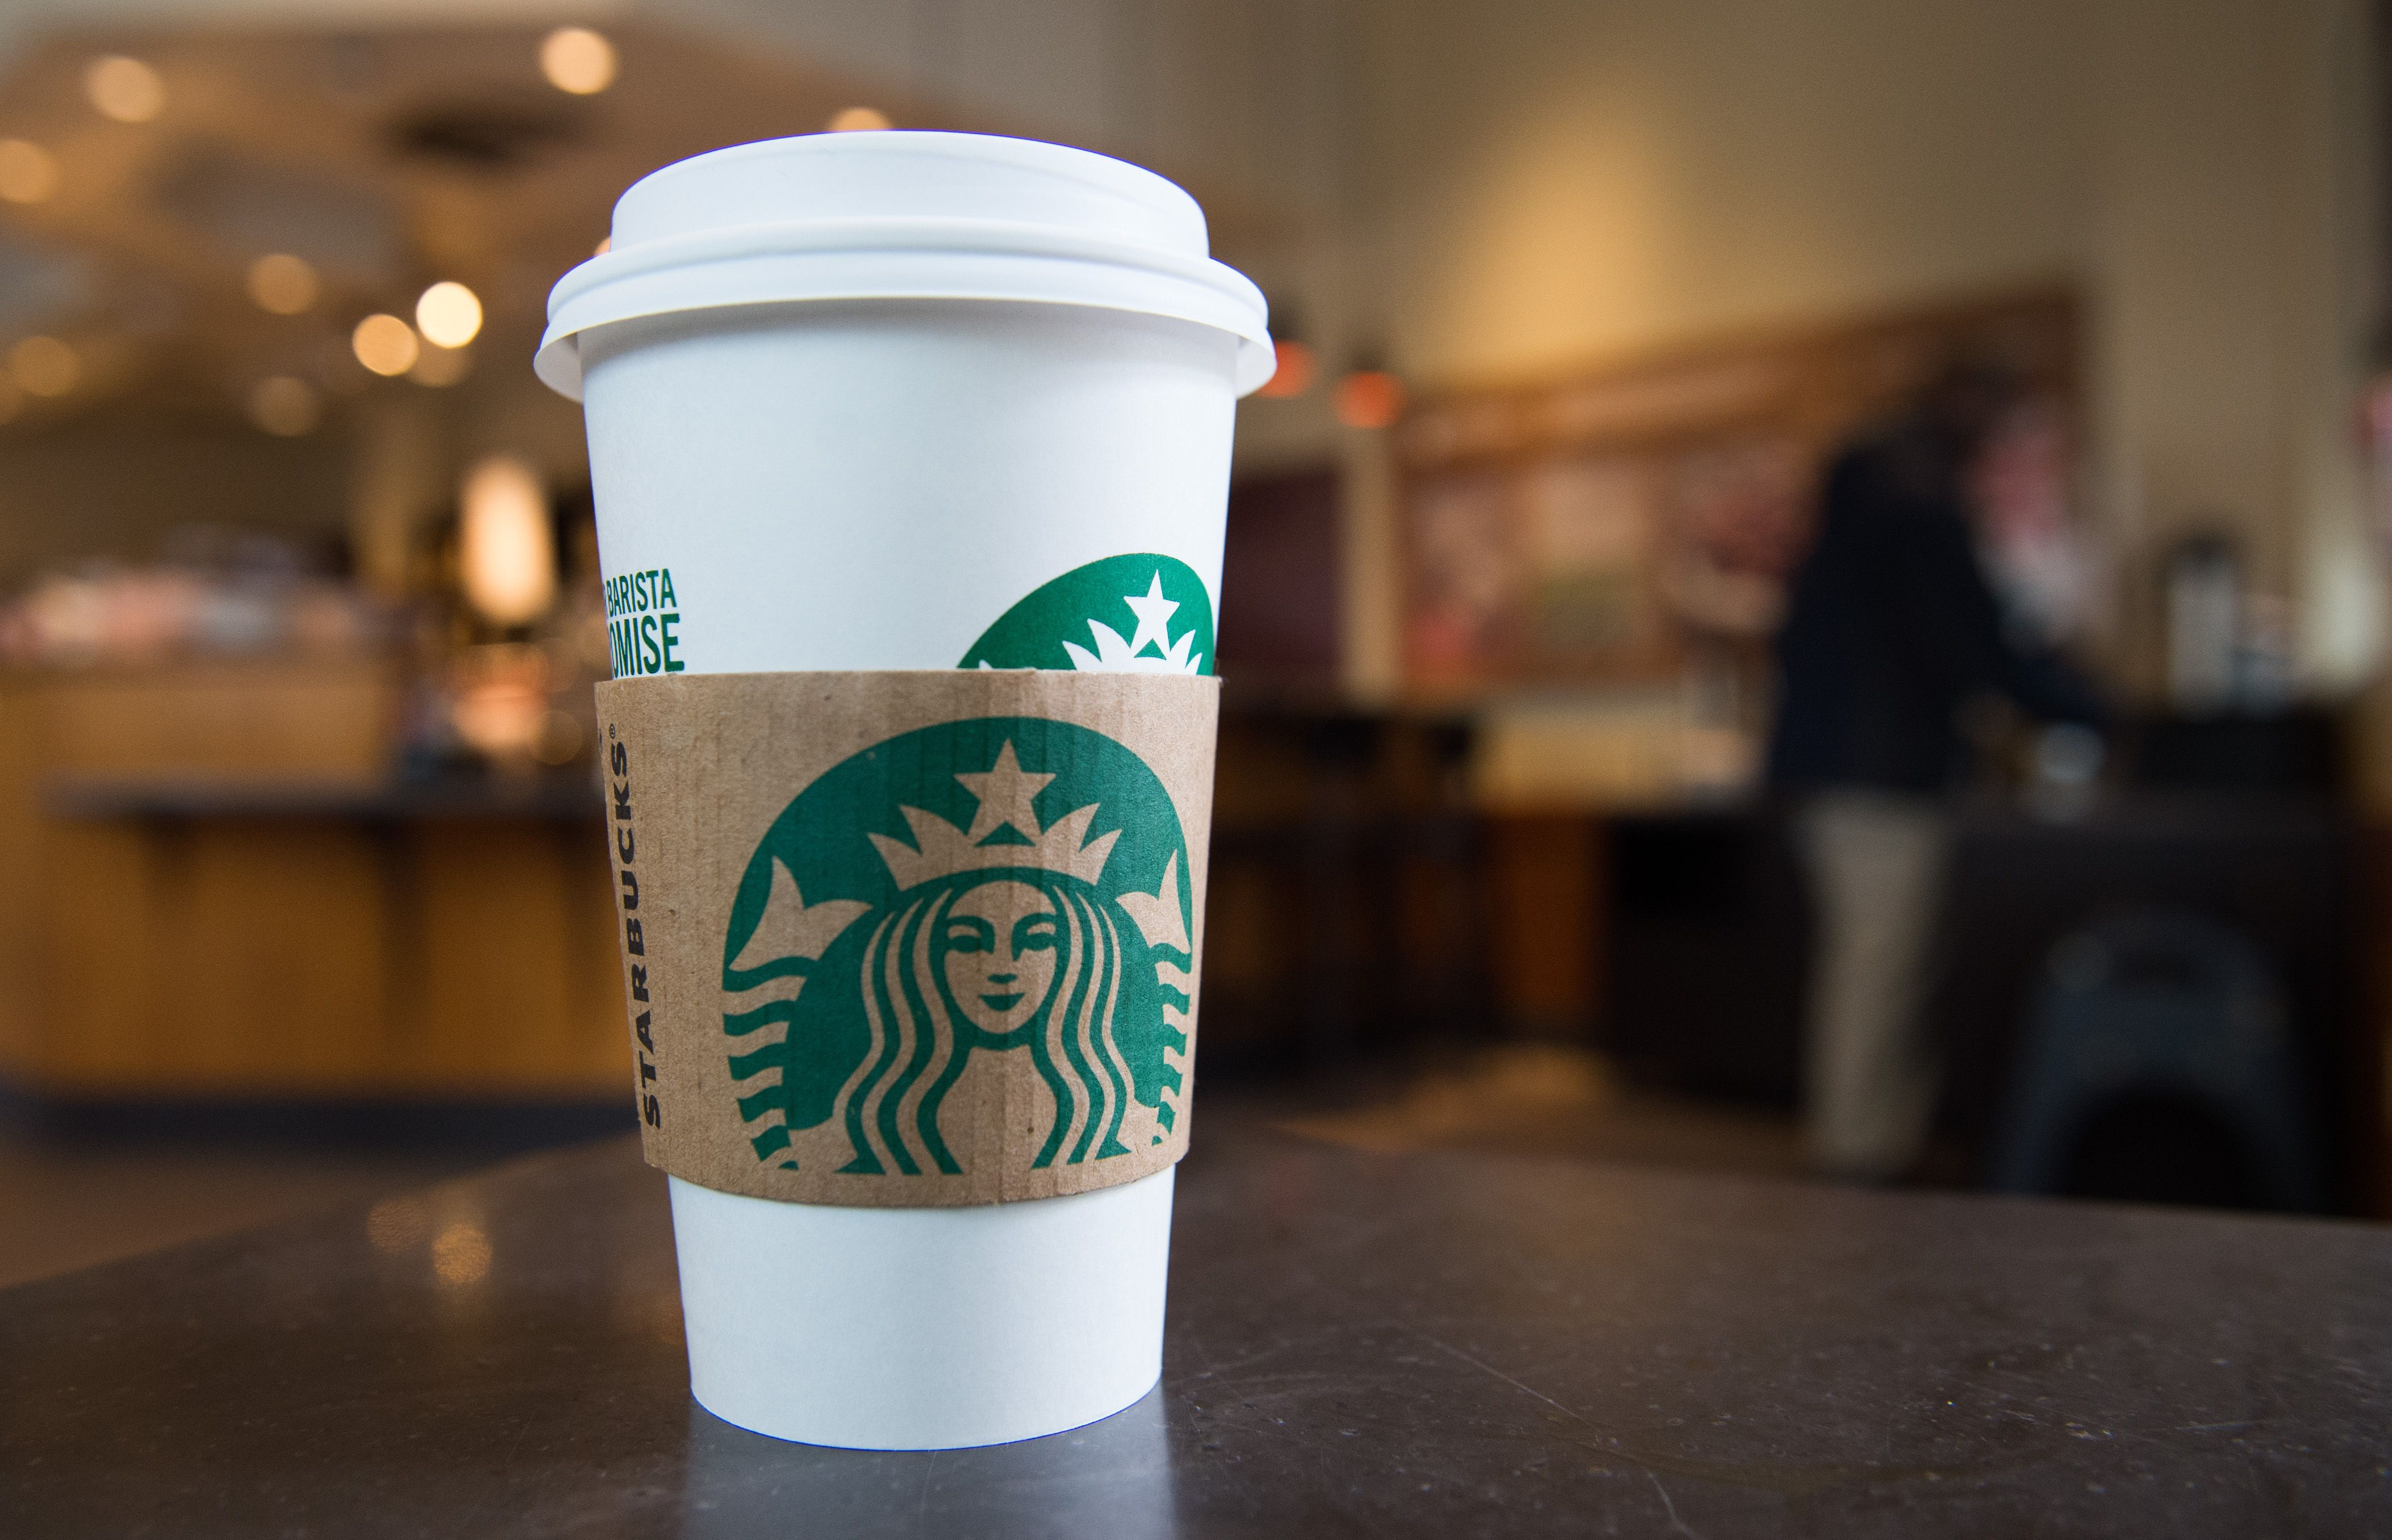 Starbucks matchmaking